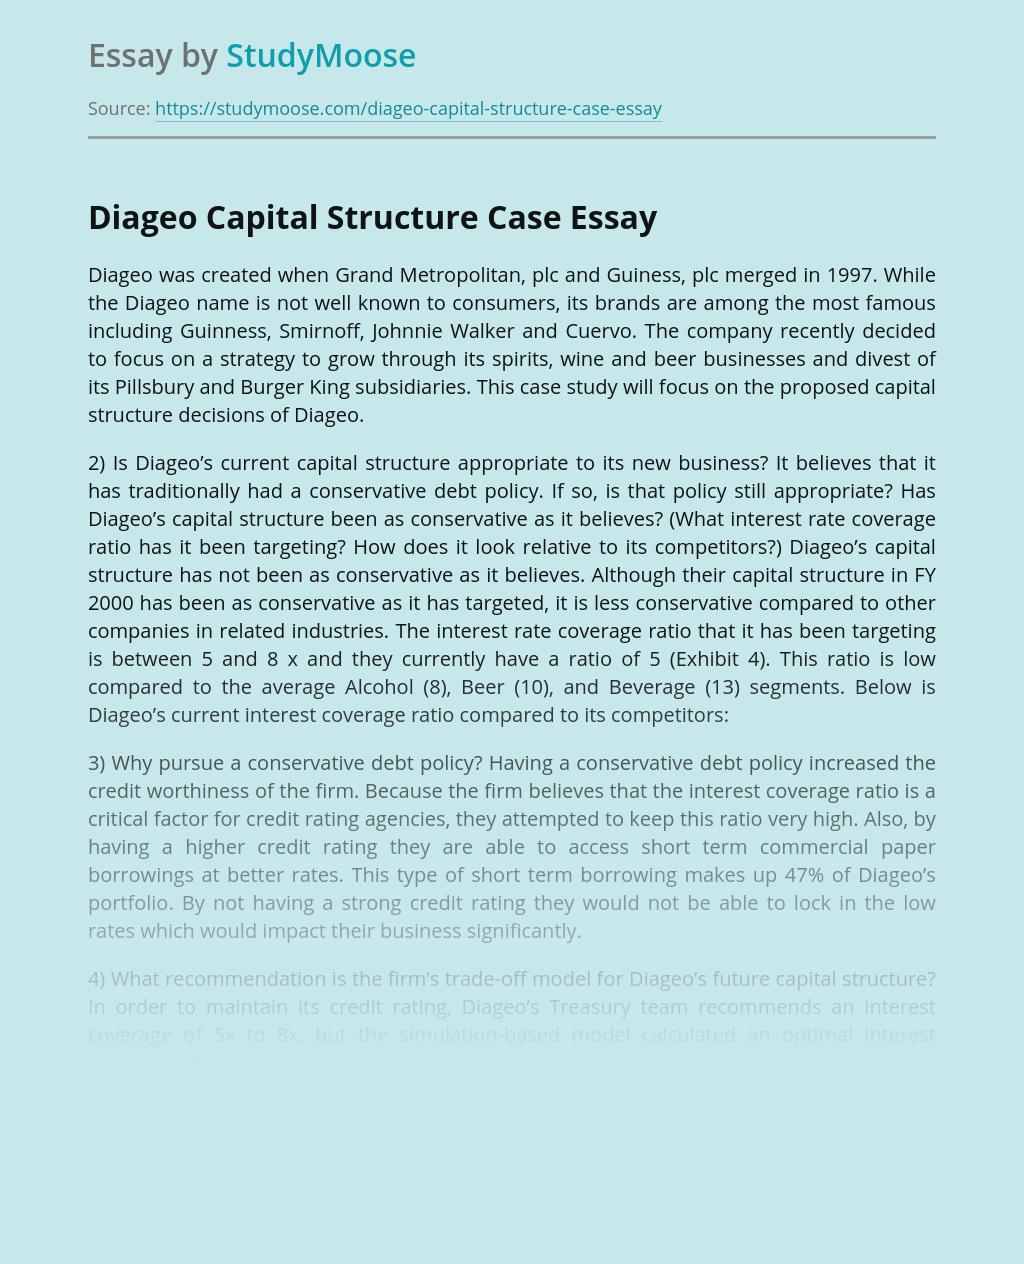 Diageo Capital Structure Case